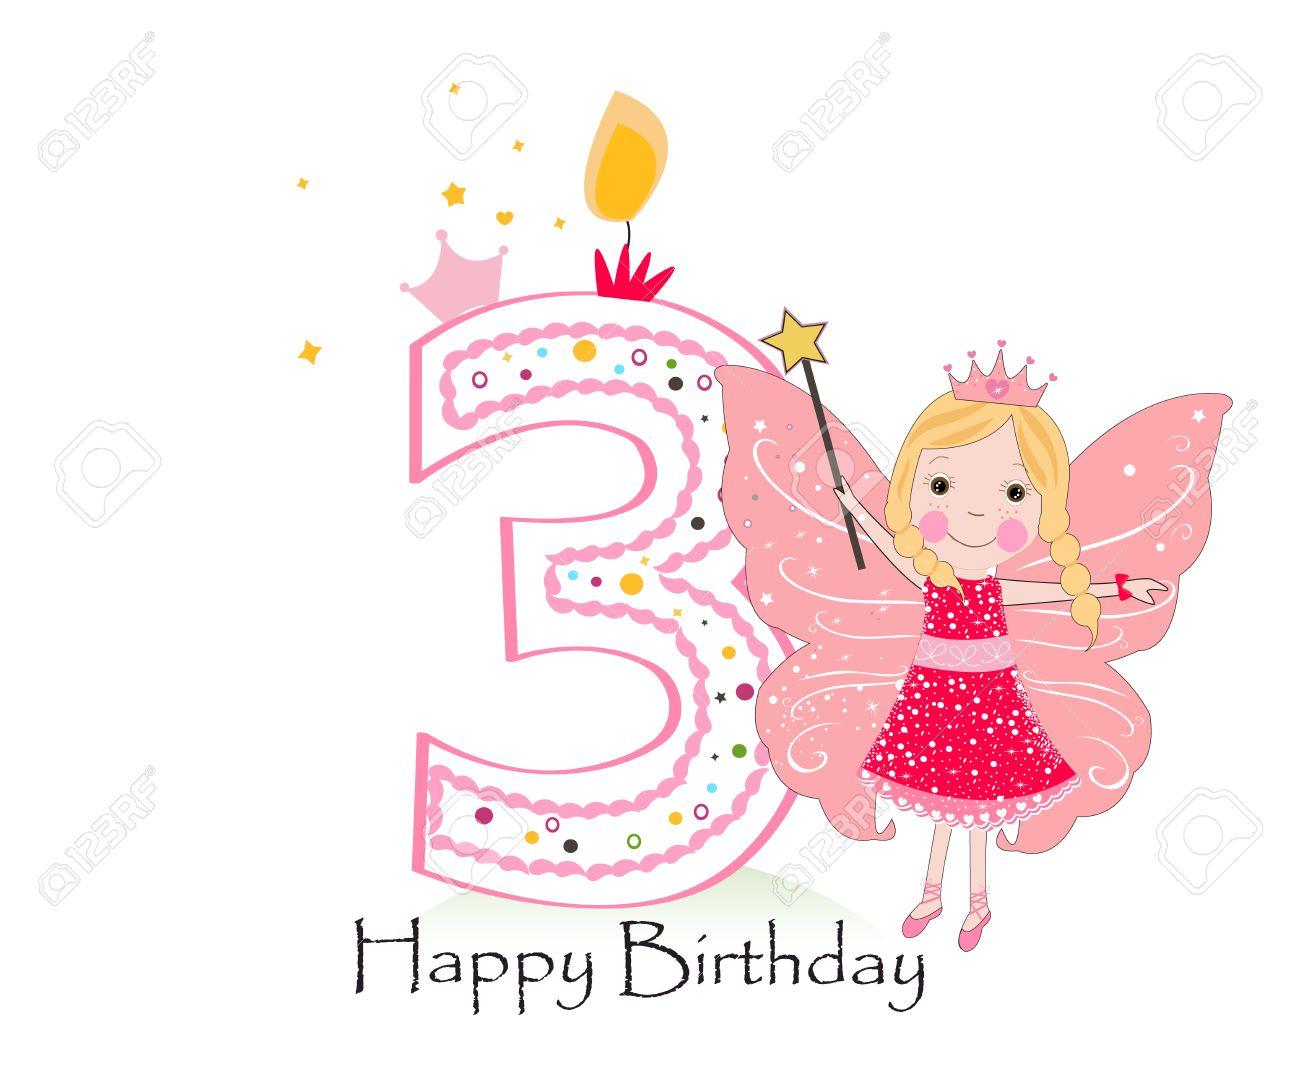 Happy third birthday candle baby girl greeting card with fairy happy third birthday candle baby girl greeting card with fairy tale vector background stock vector kristyandbryce Choice Image